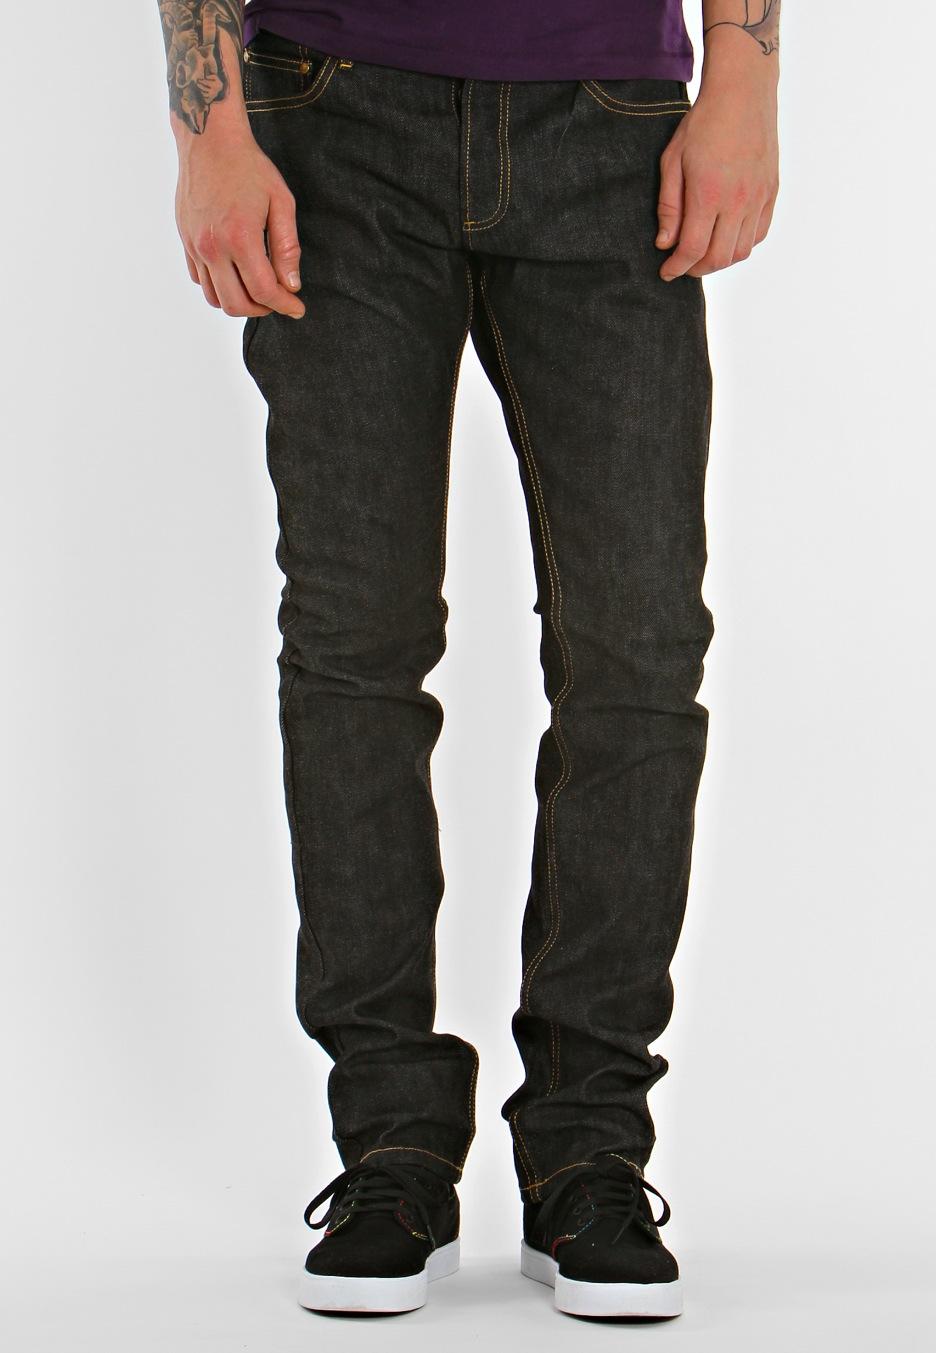 Skinny Legged Jeans